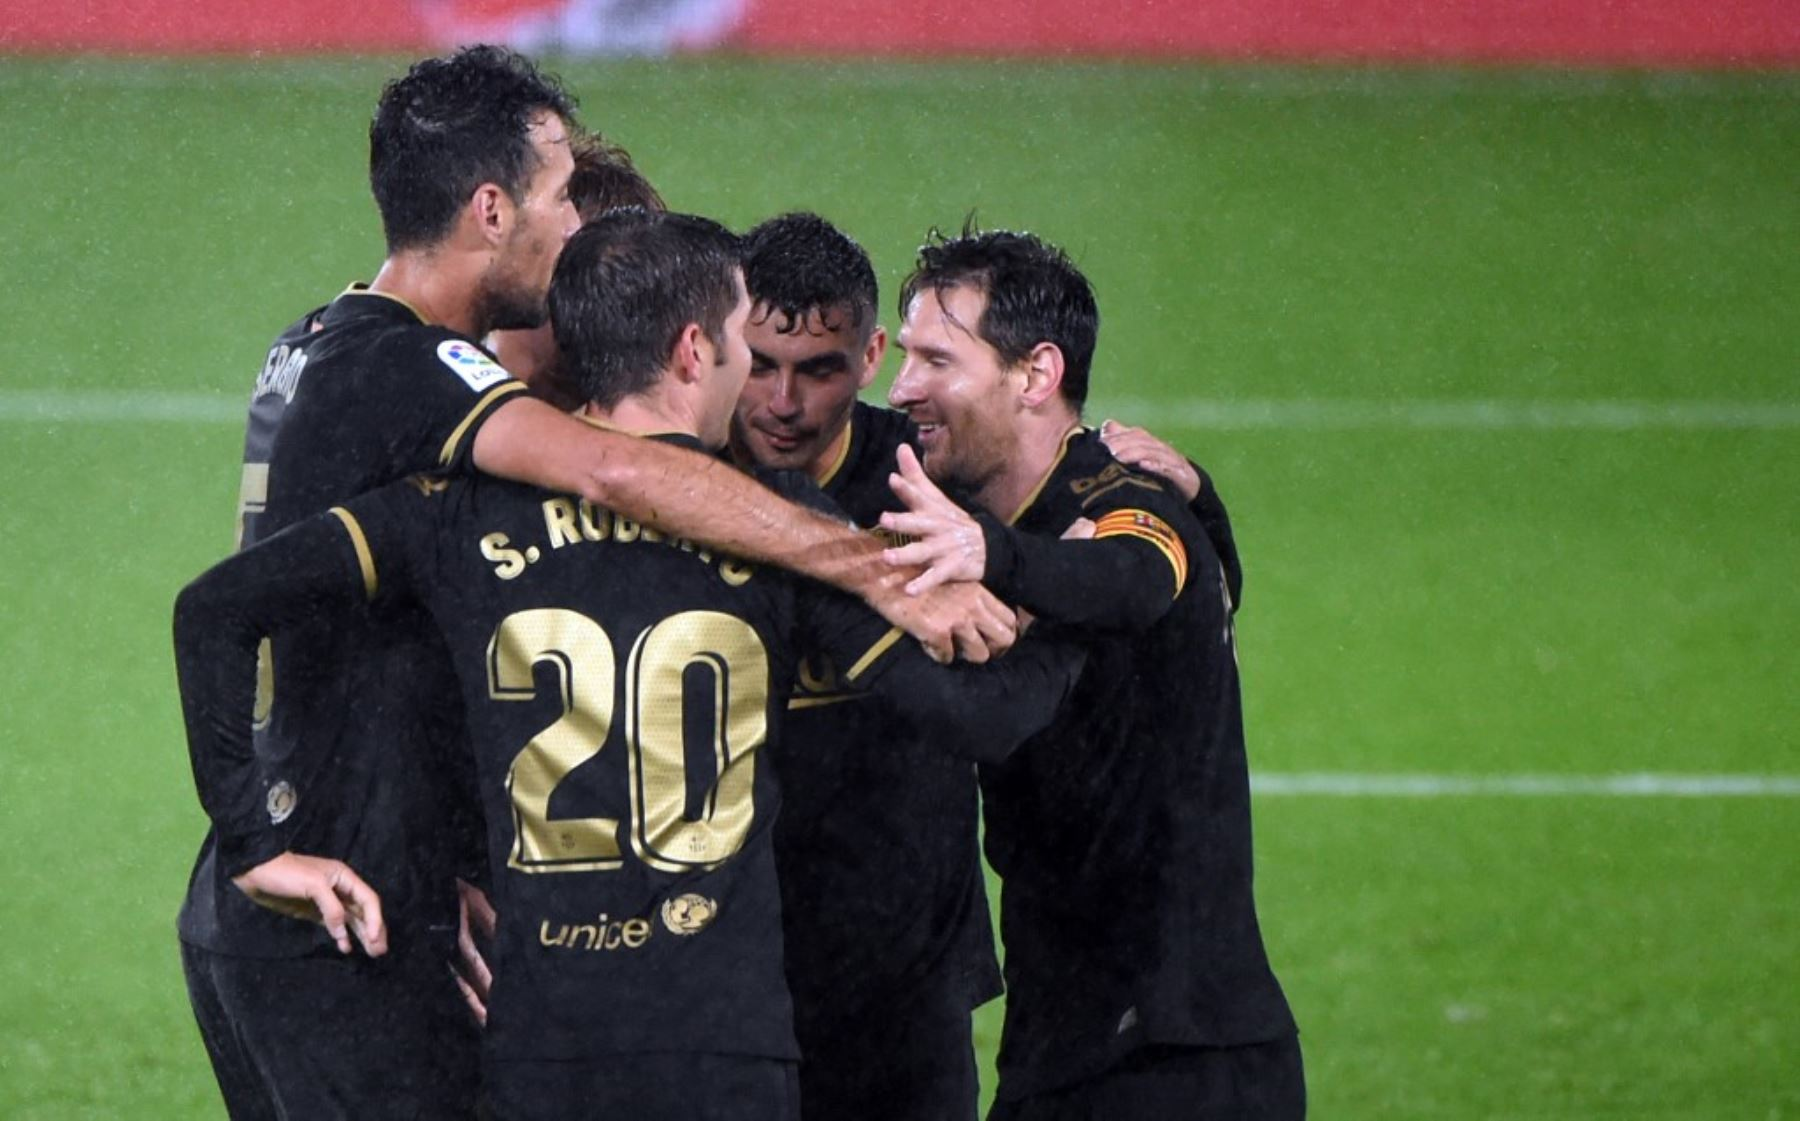 Barcelona goleó 3-0 al Celta de Vido del peruano Renato Tapia. Foto: AFP